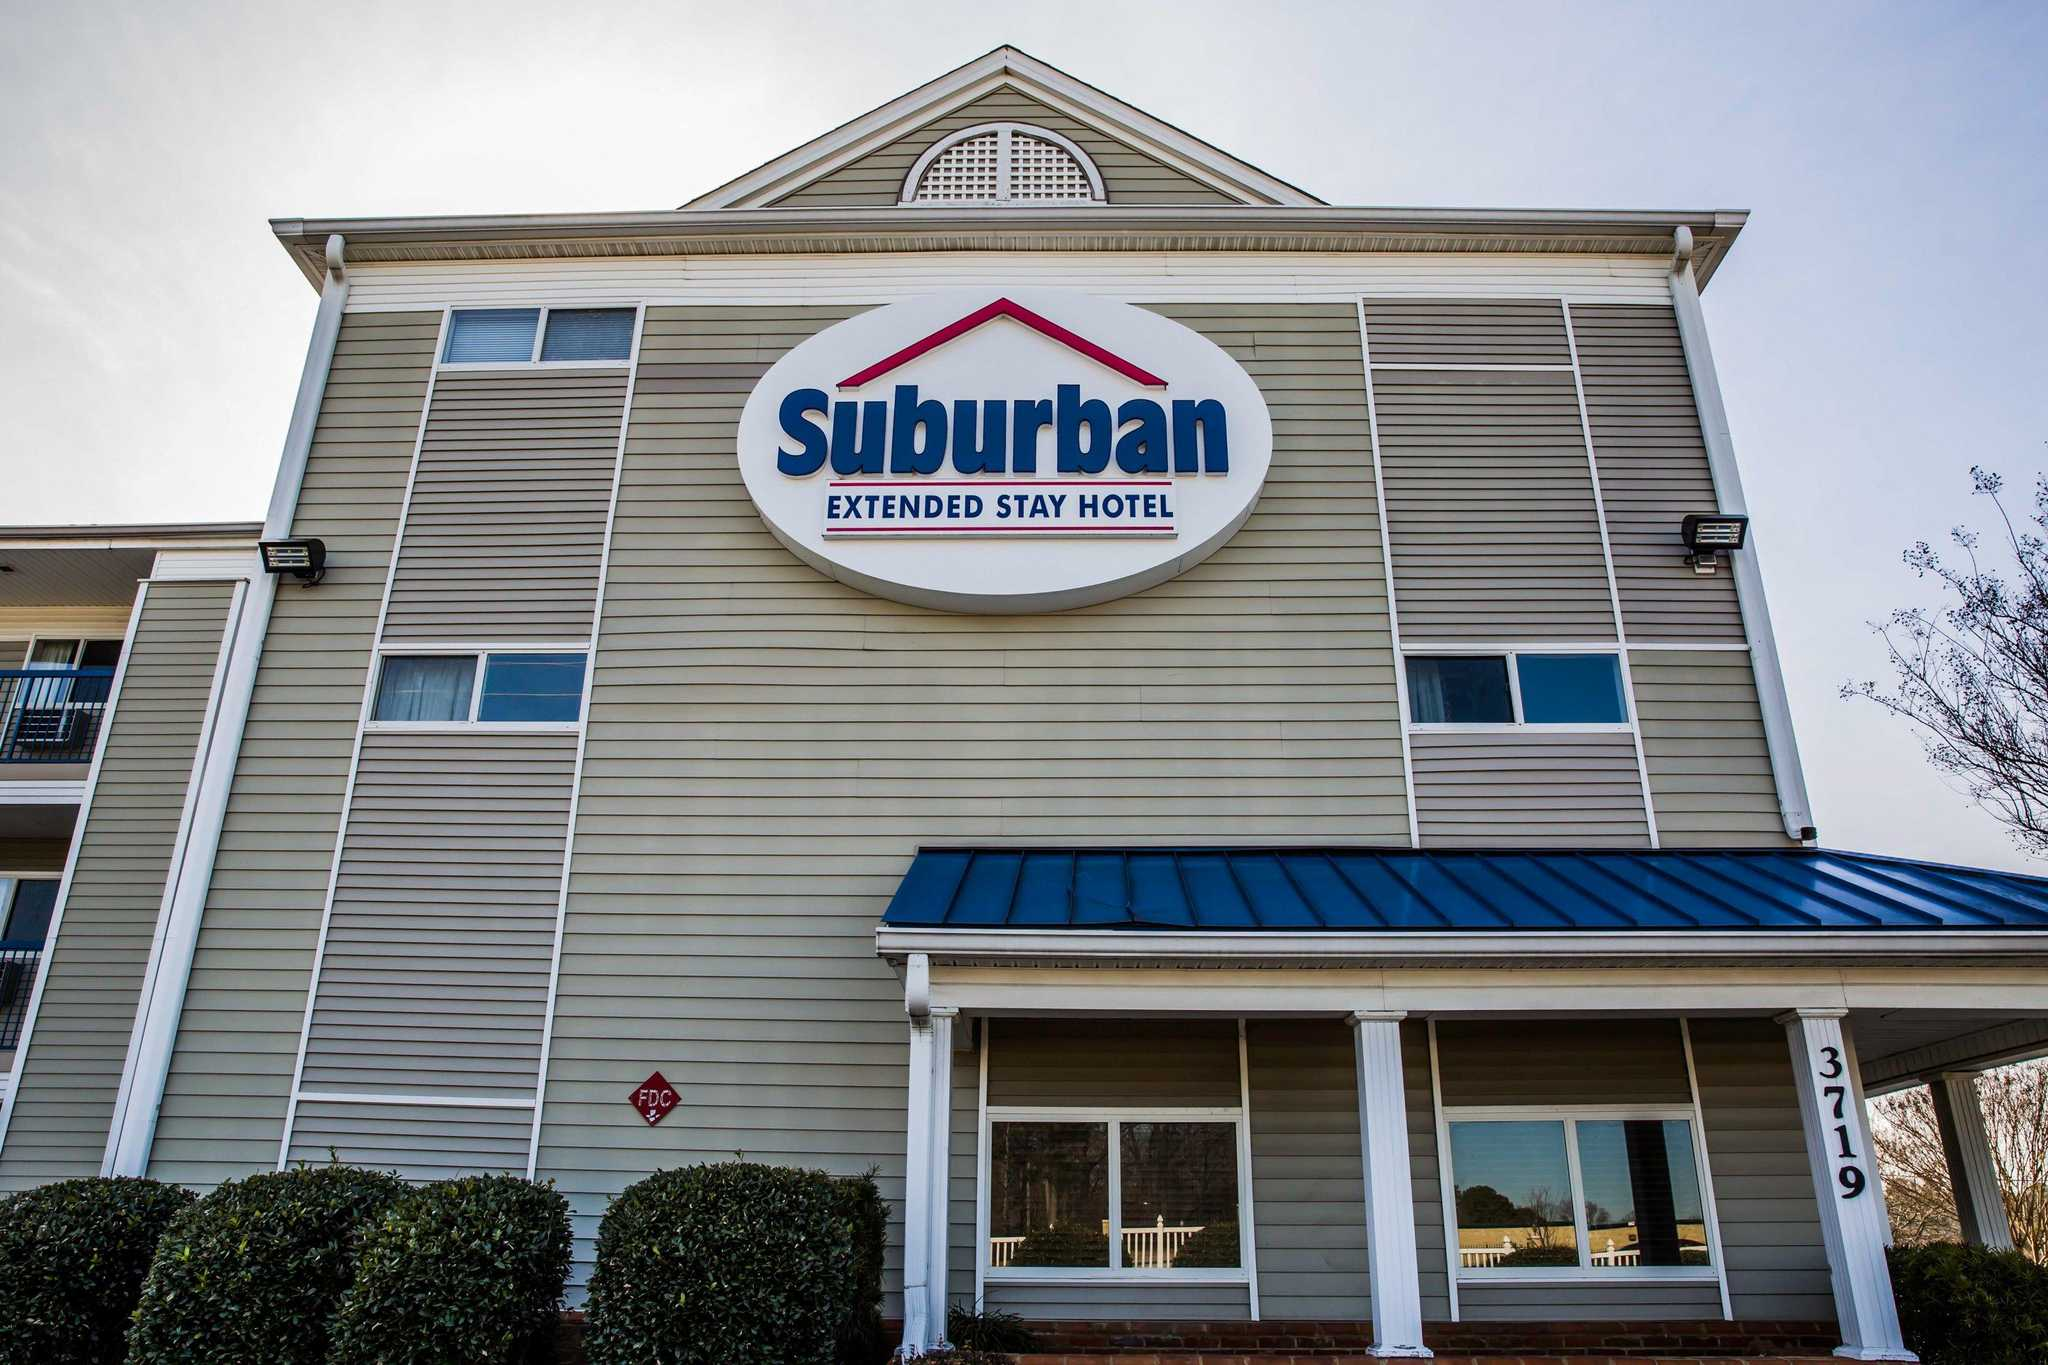 Suburban Extended Stay Hotel Chester UnitedStates